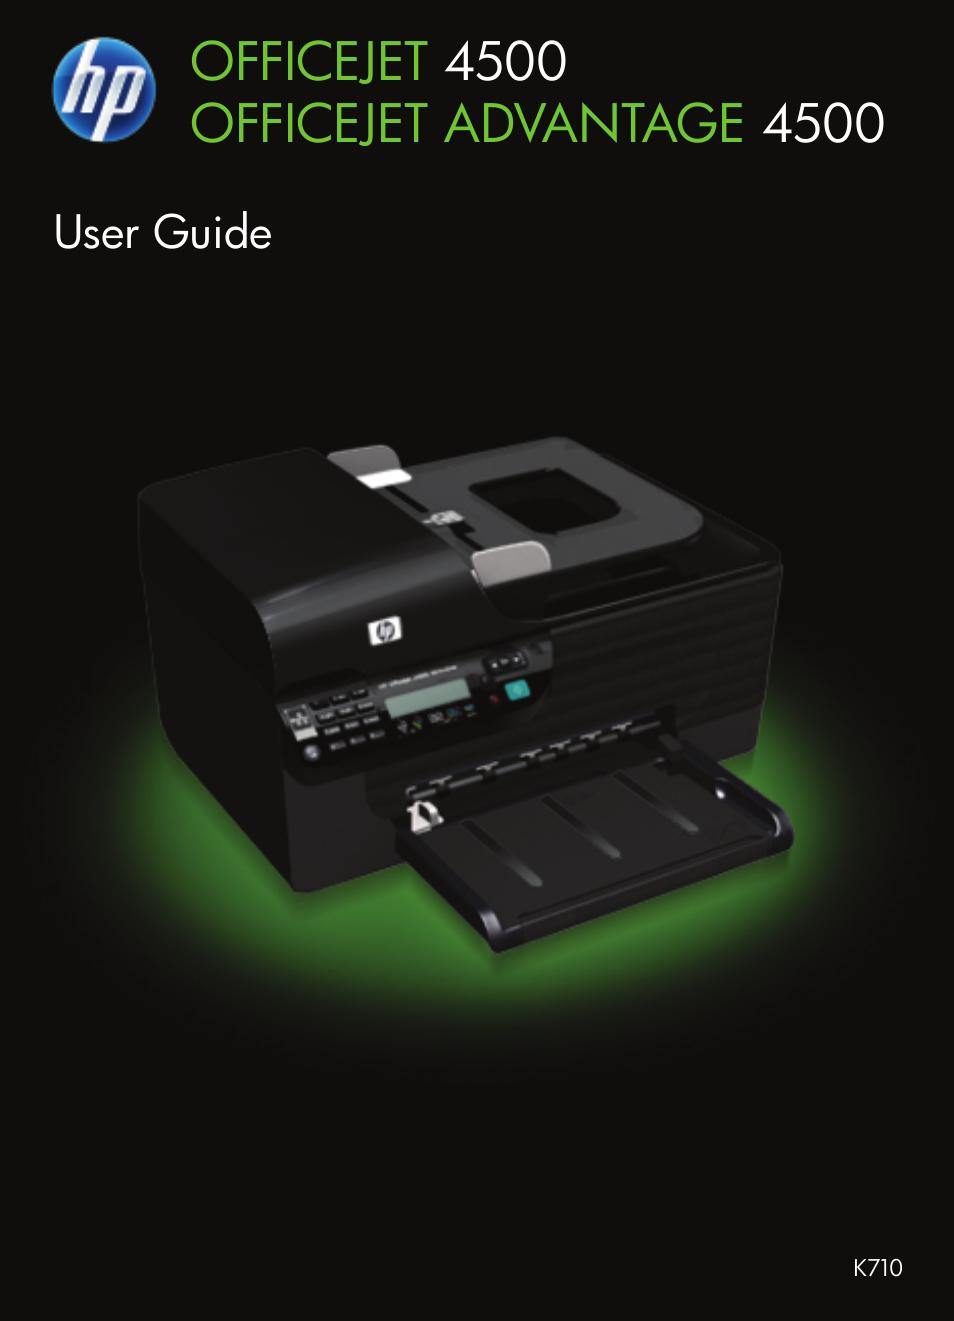 HP OFFICEJET 4500 User Manual | 228 pages | Also for: Officejet 4575  (K710a), Officejet Advantage 4500 (K710)